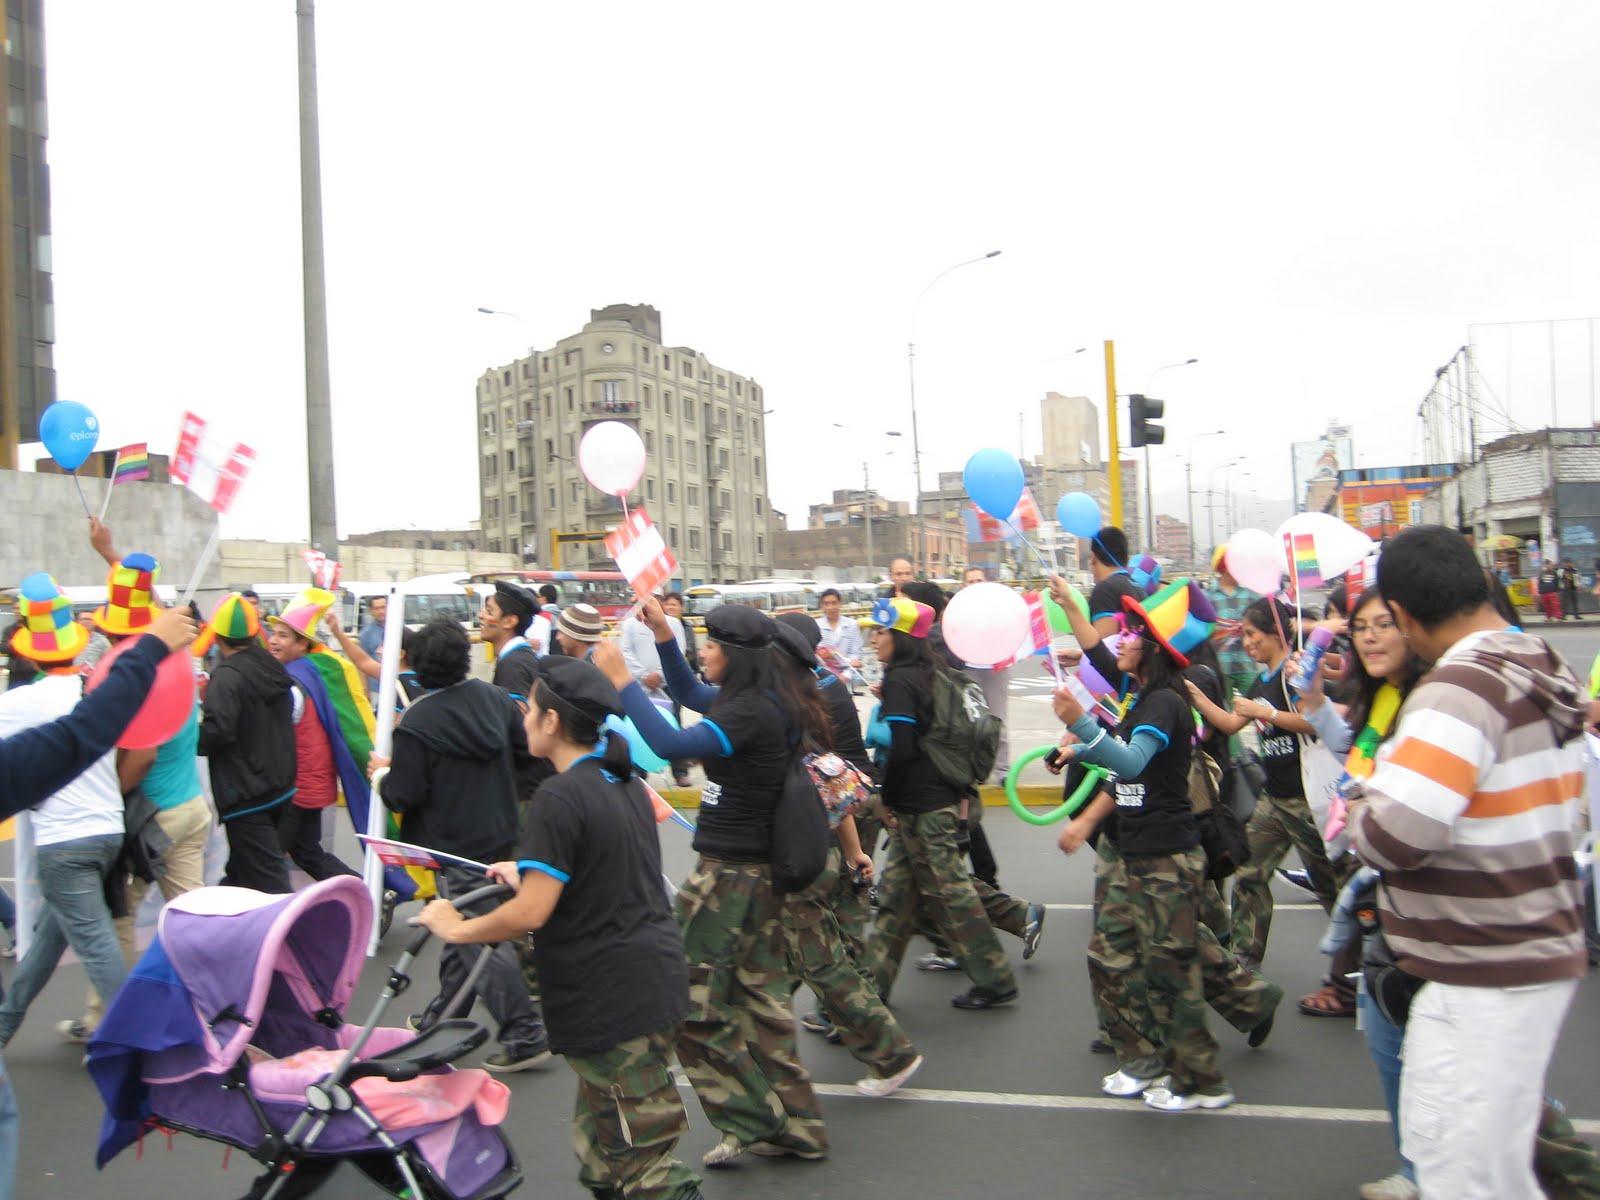 peruvian escort militar gay